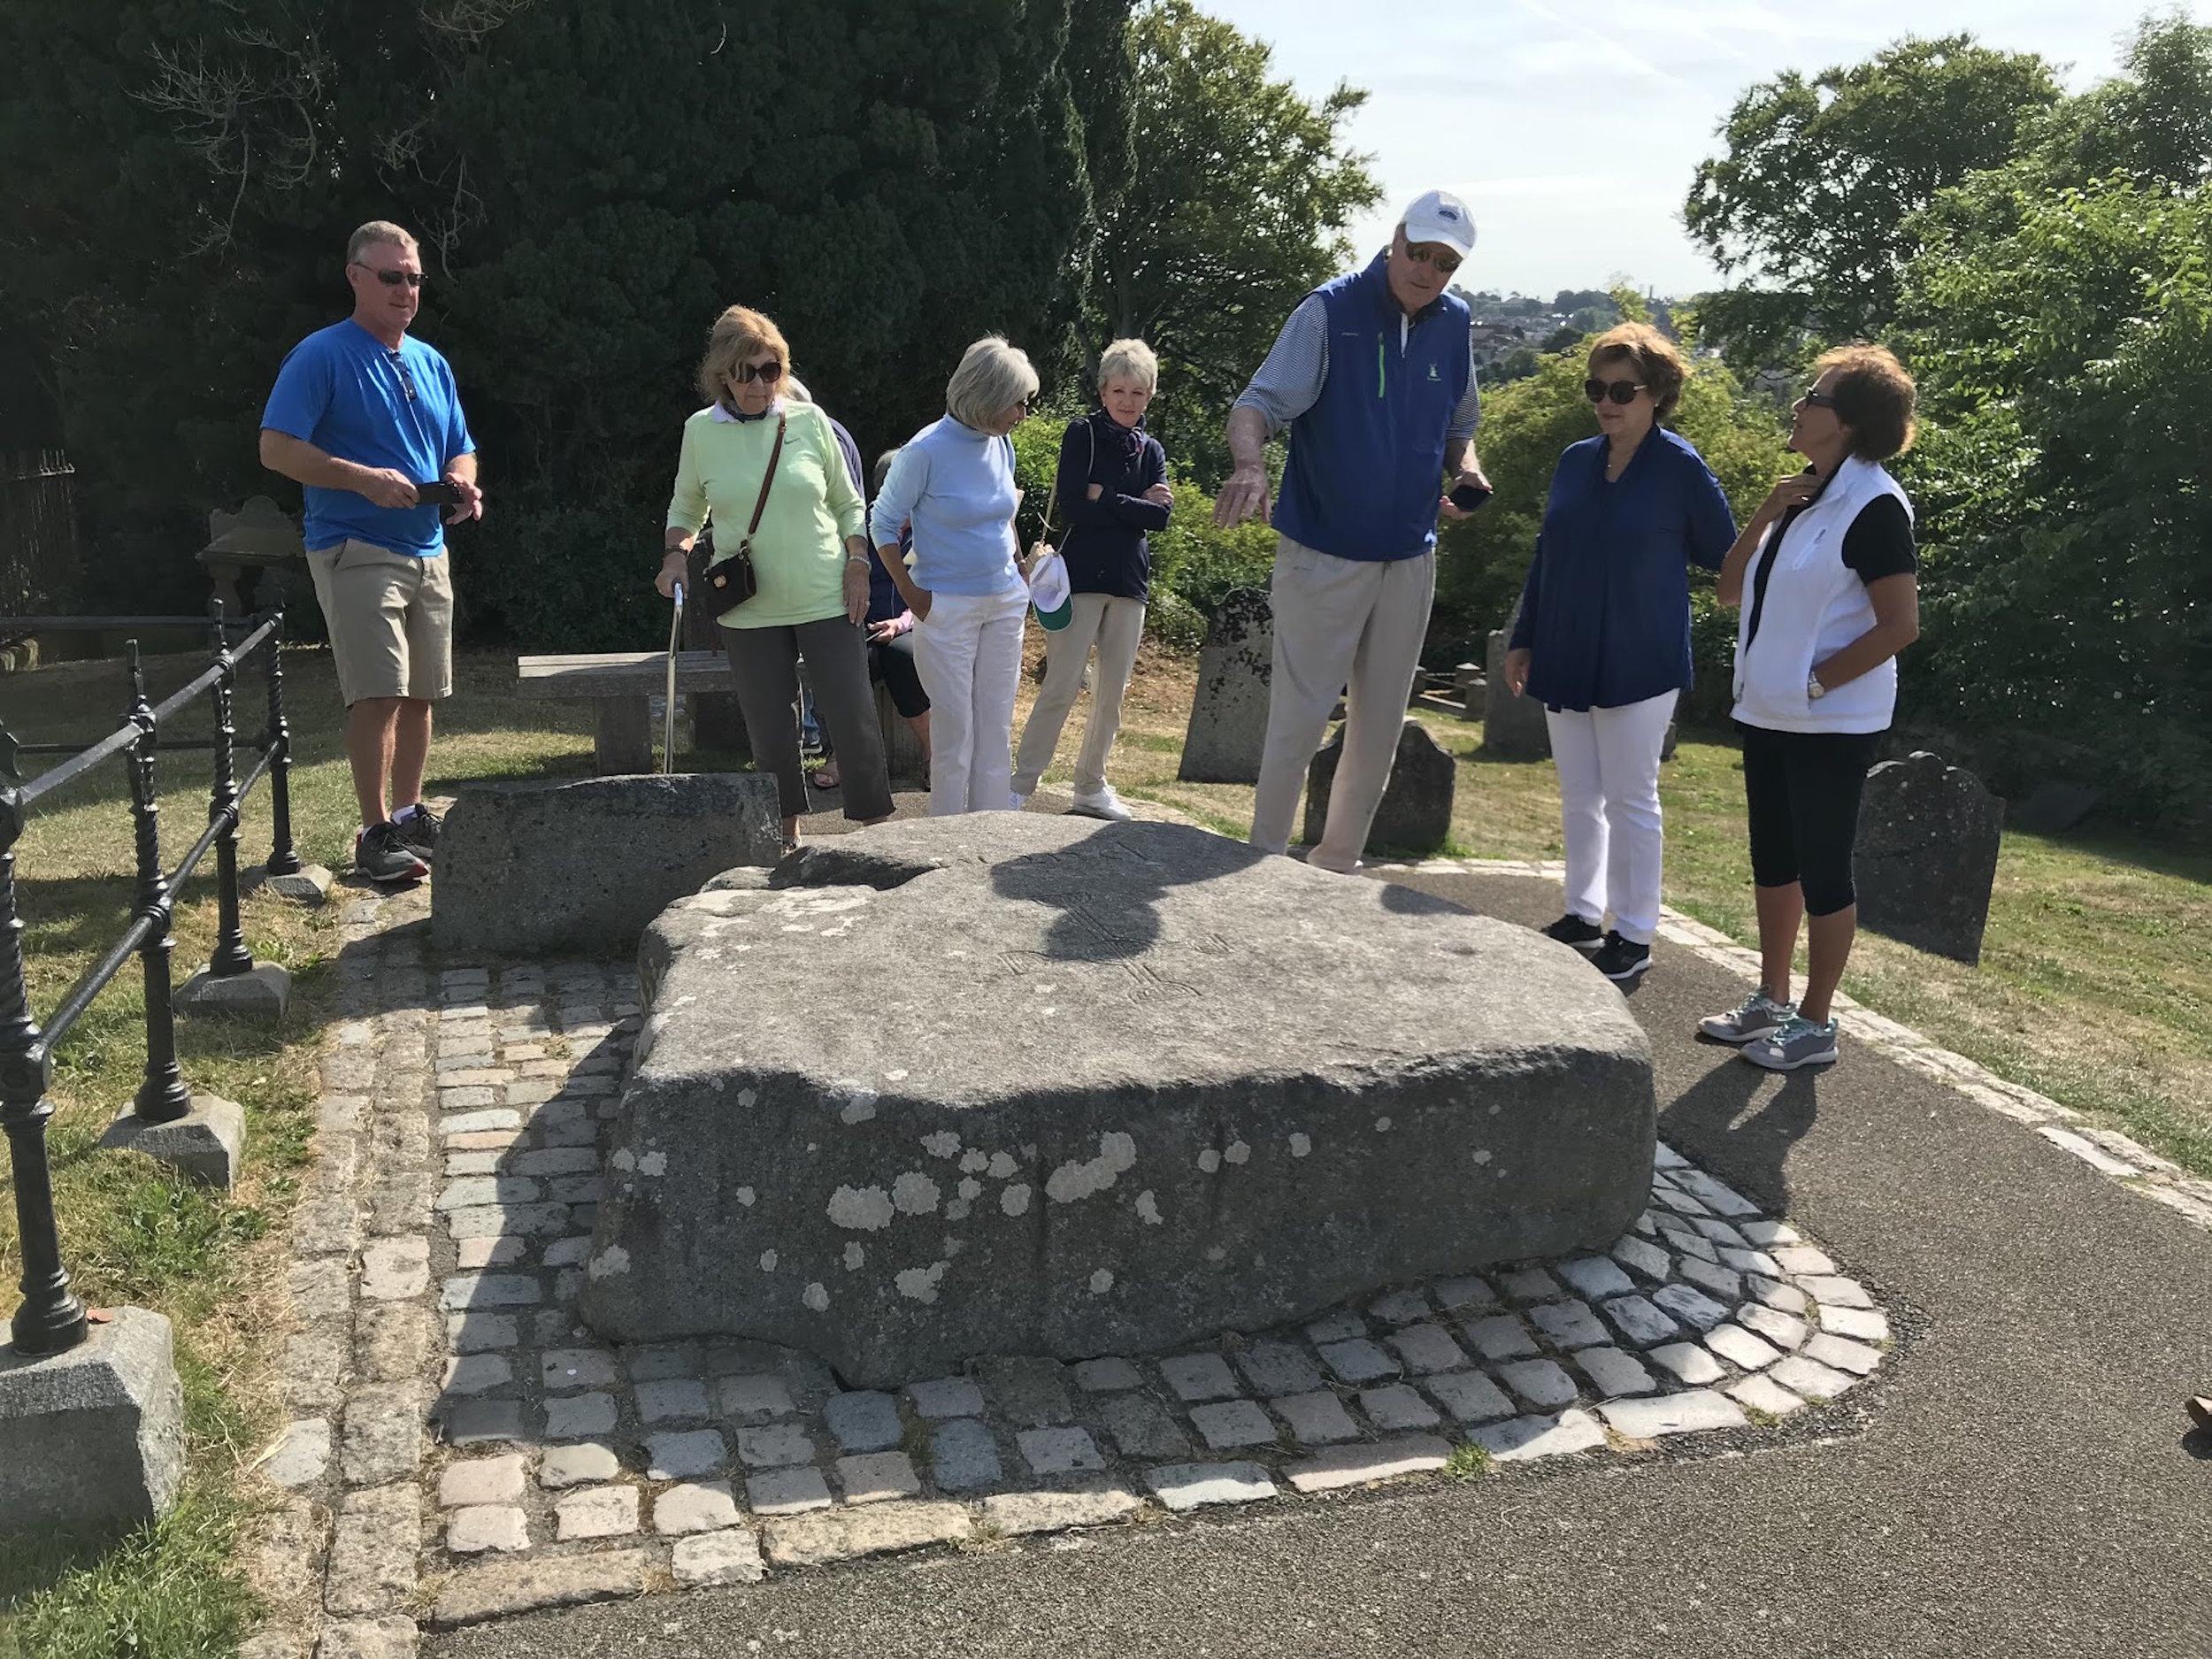 siant patricks grave site art workshops in northern Ireland.jpeg